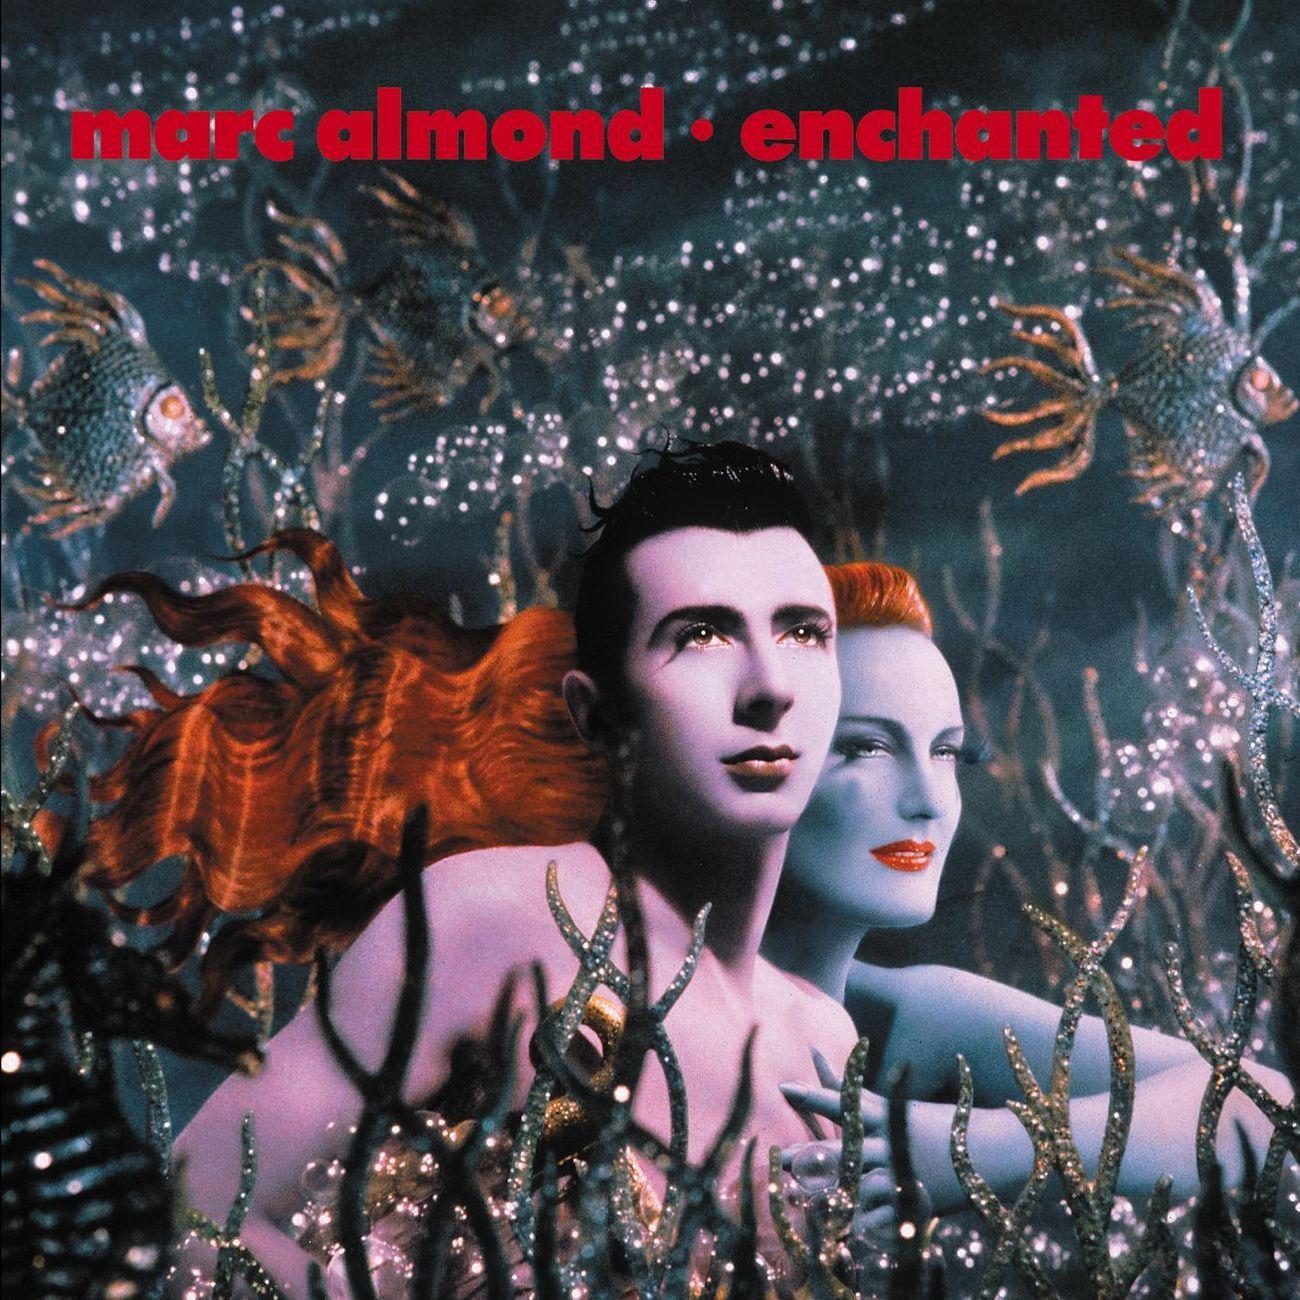 Marc Almond Enchanted | Album covers i like | Pinterest